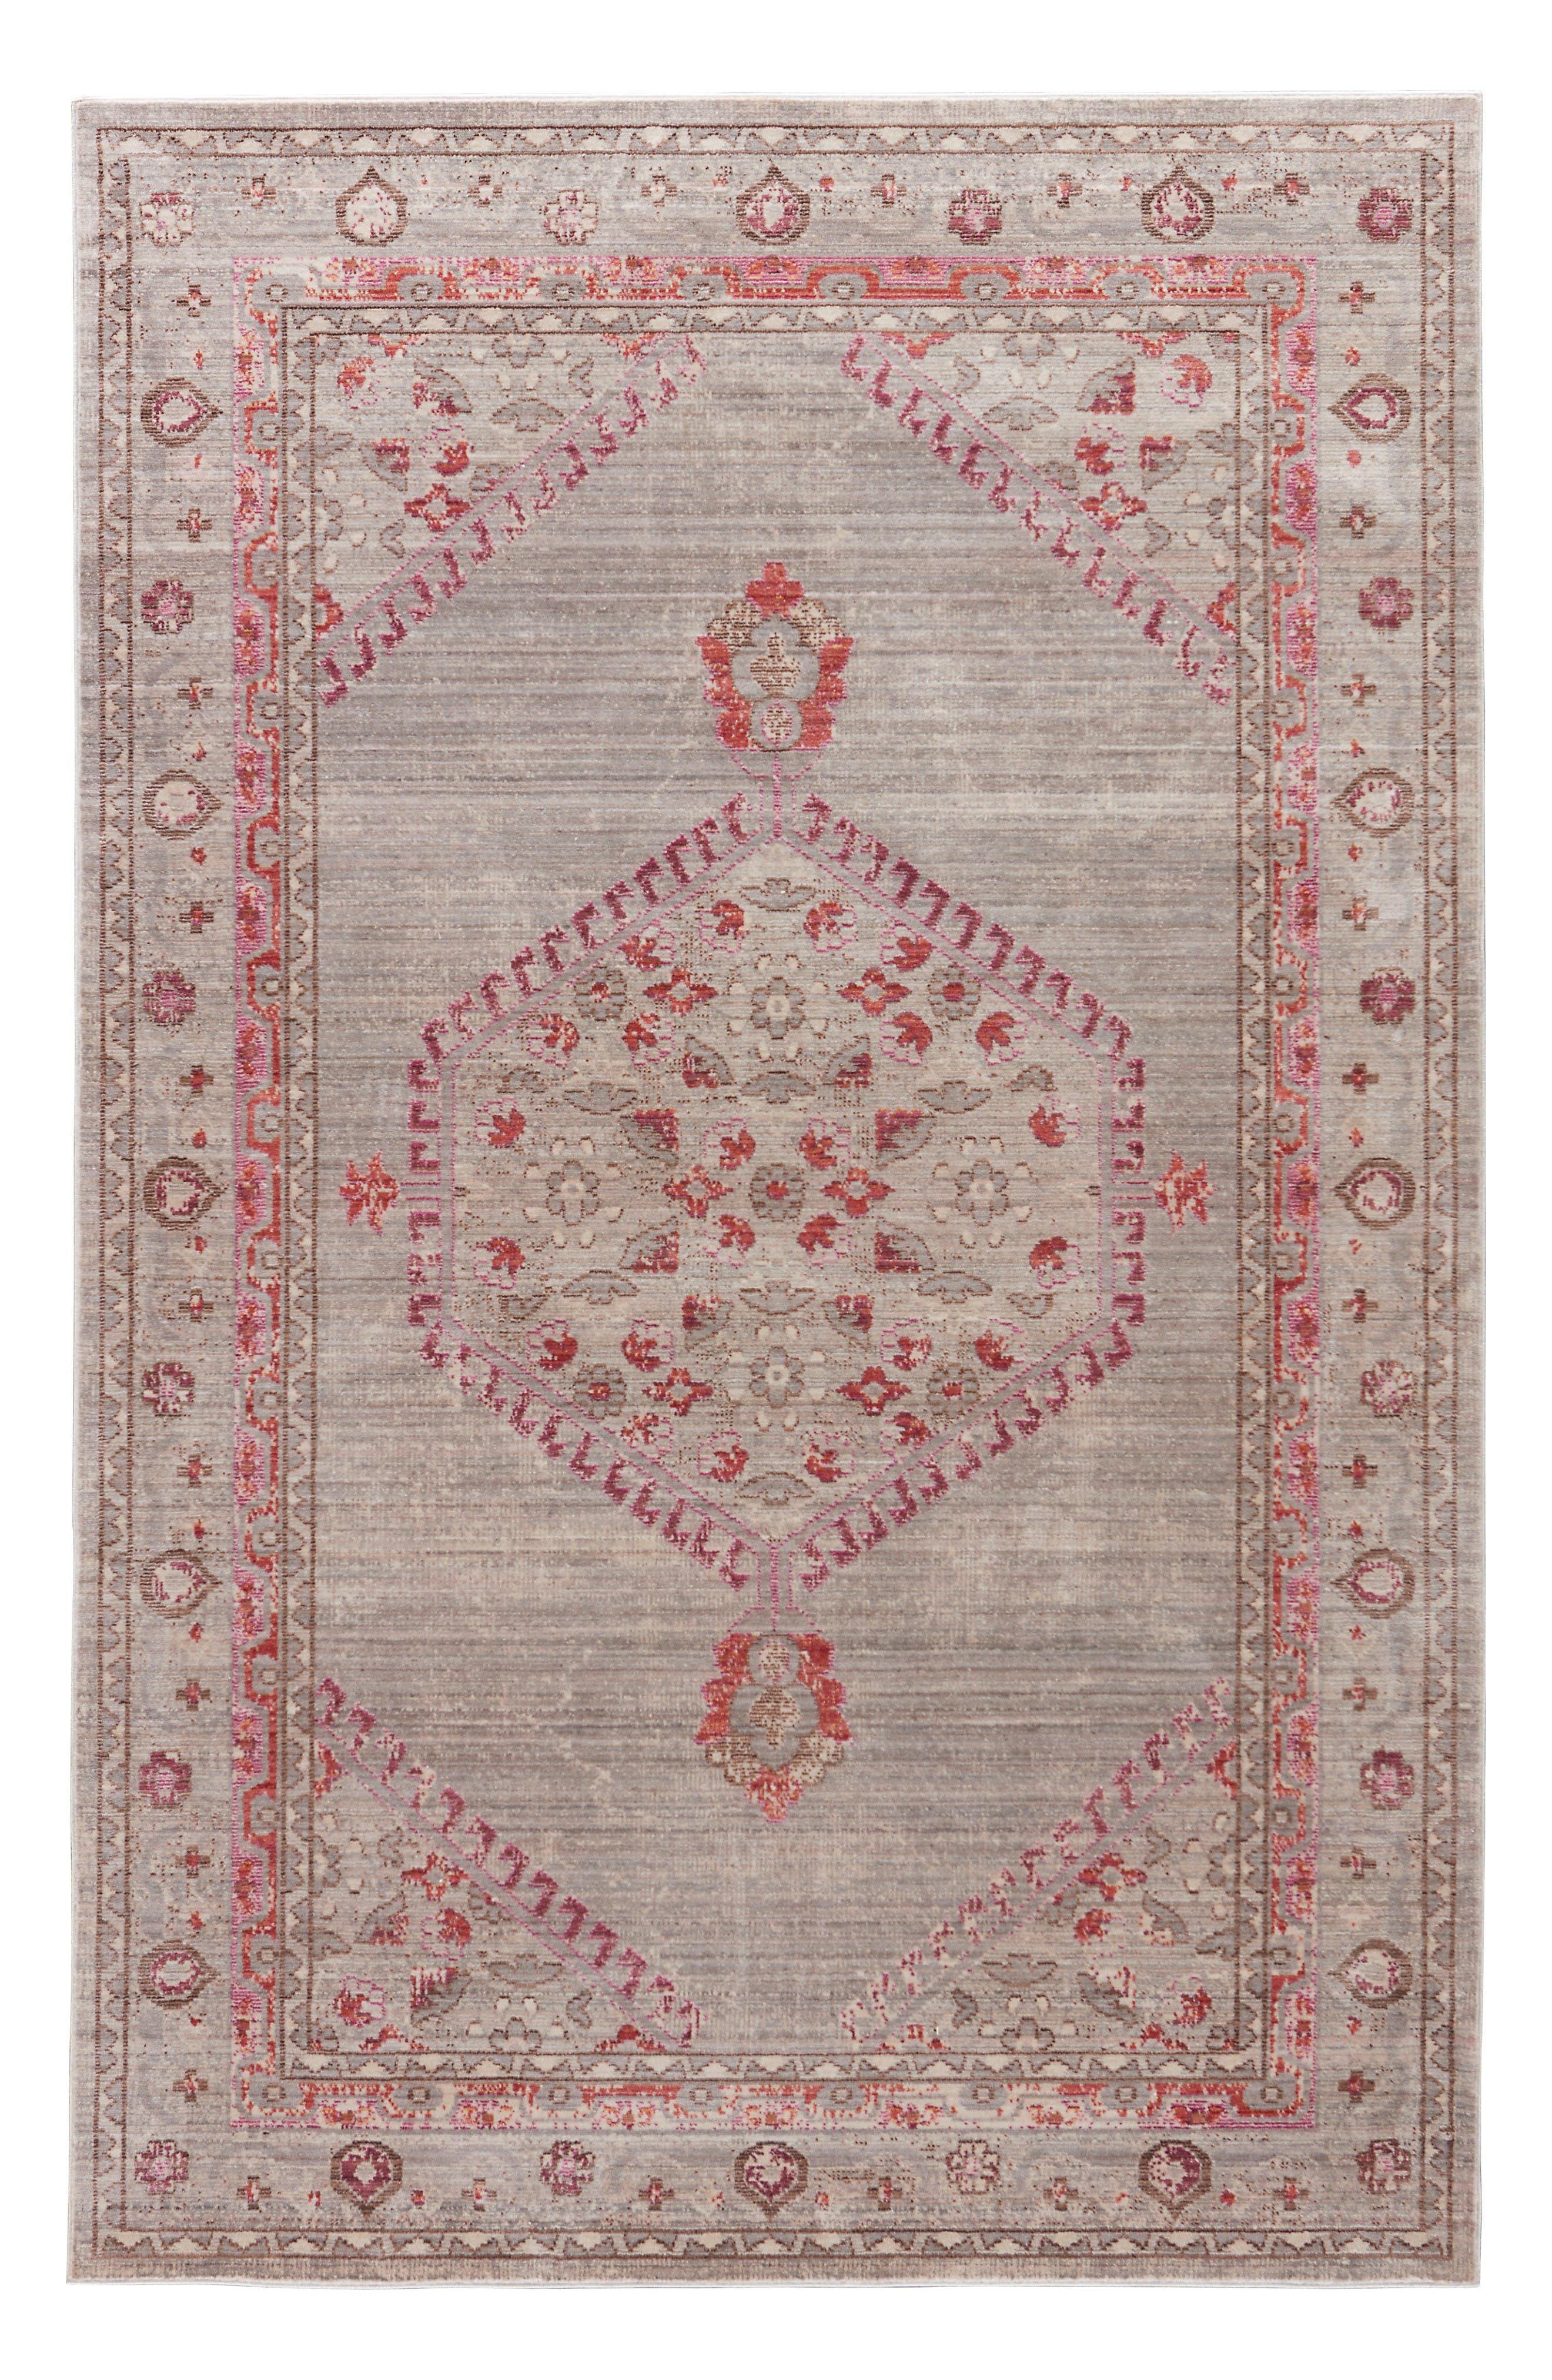 Main Image - Jaipur Contemporary Vintage Rug